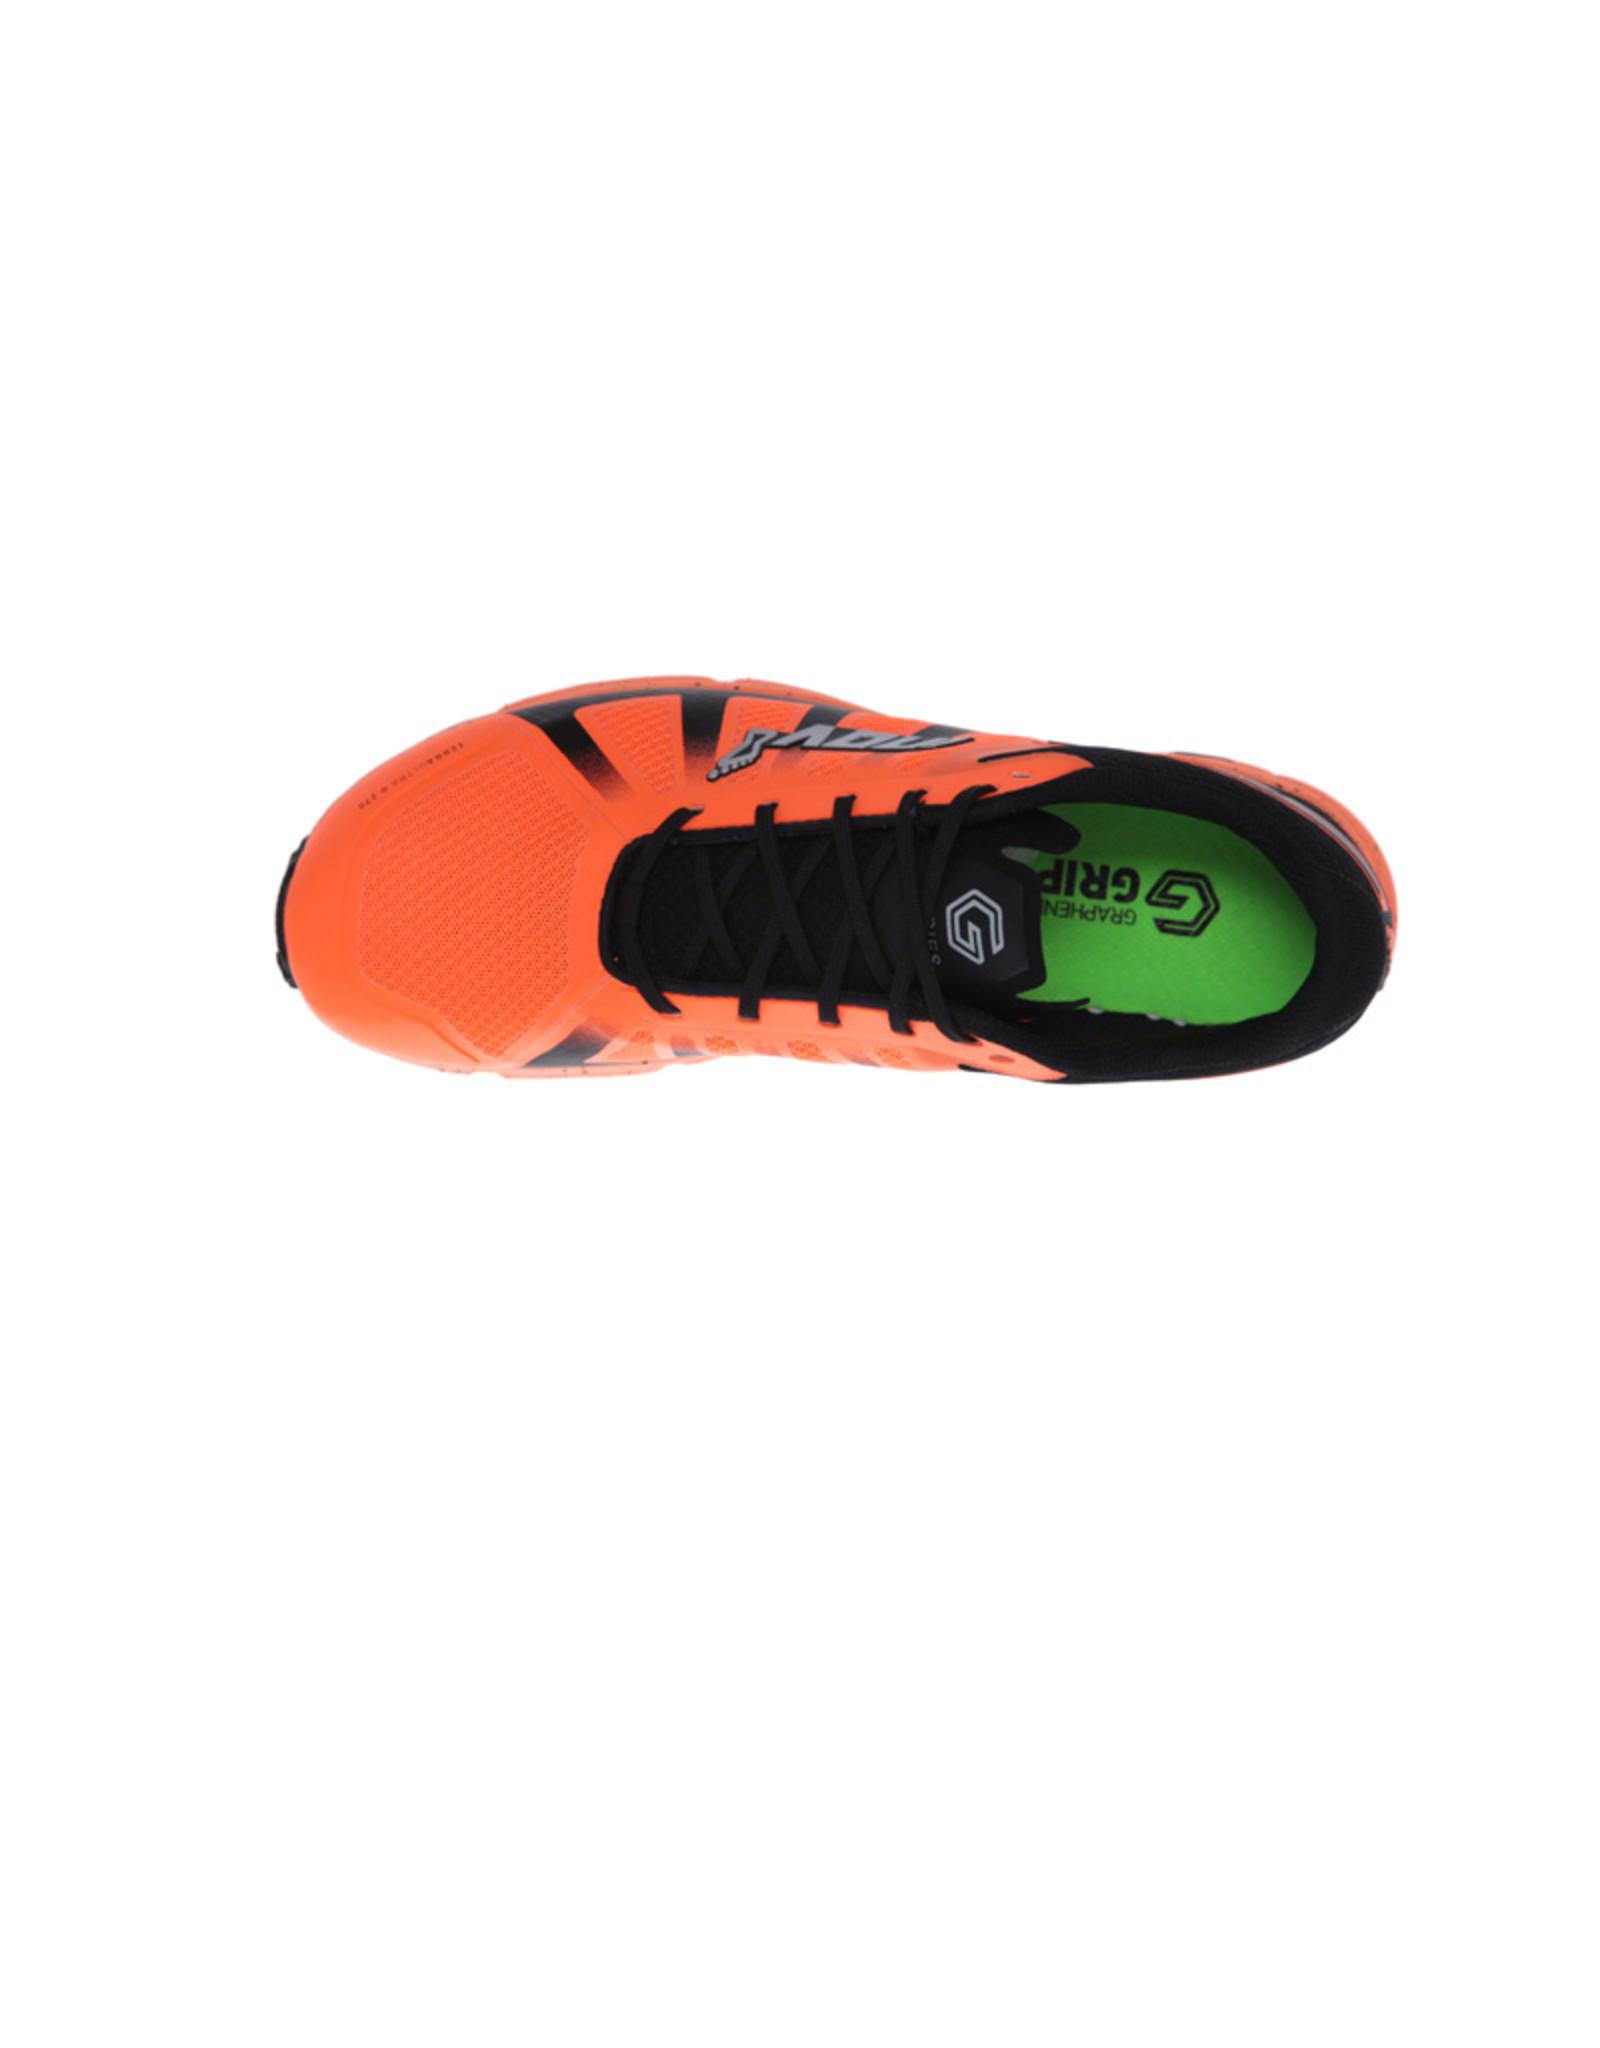 Inov-8 Terraultra G 270 Chaussure Trailrun - Orange/Noir